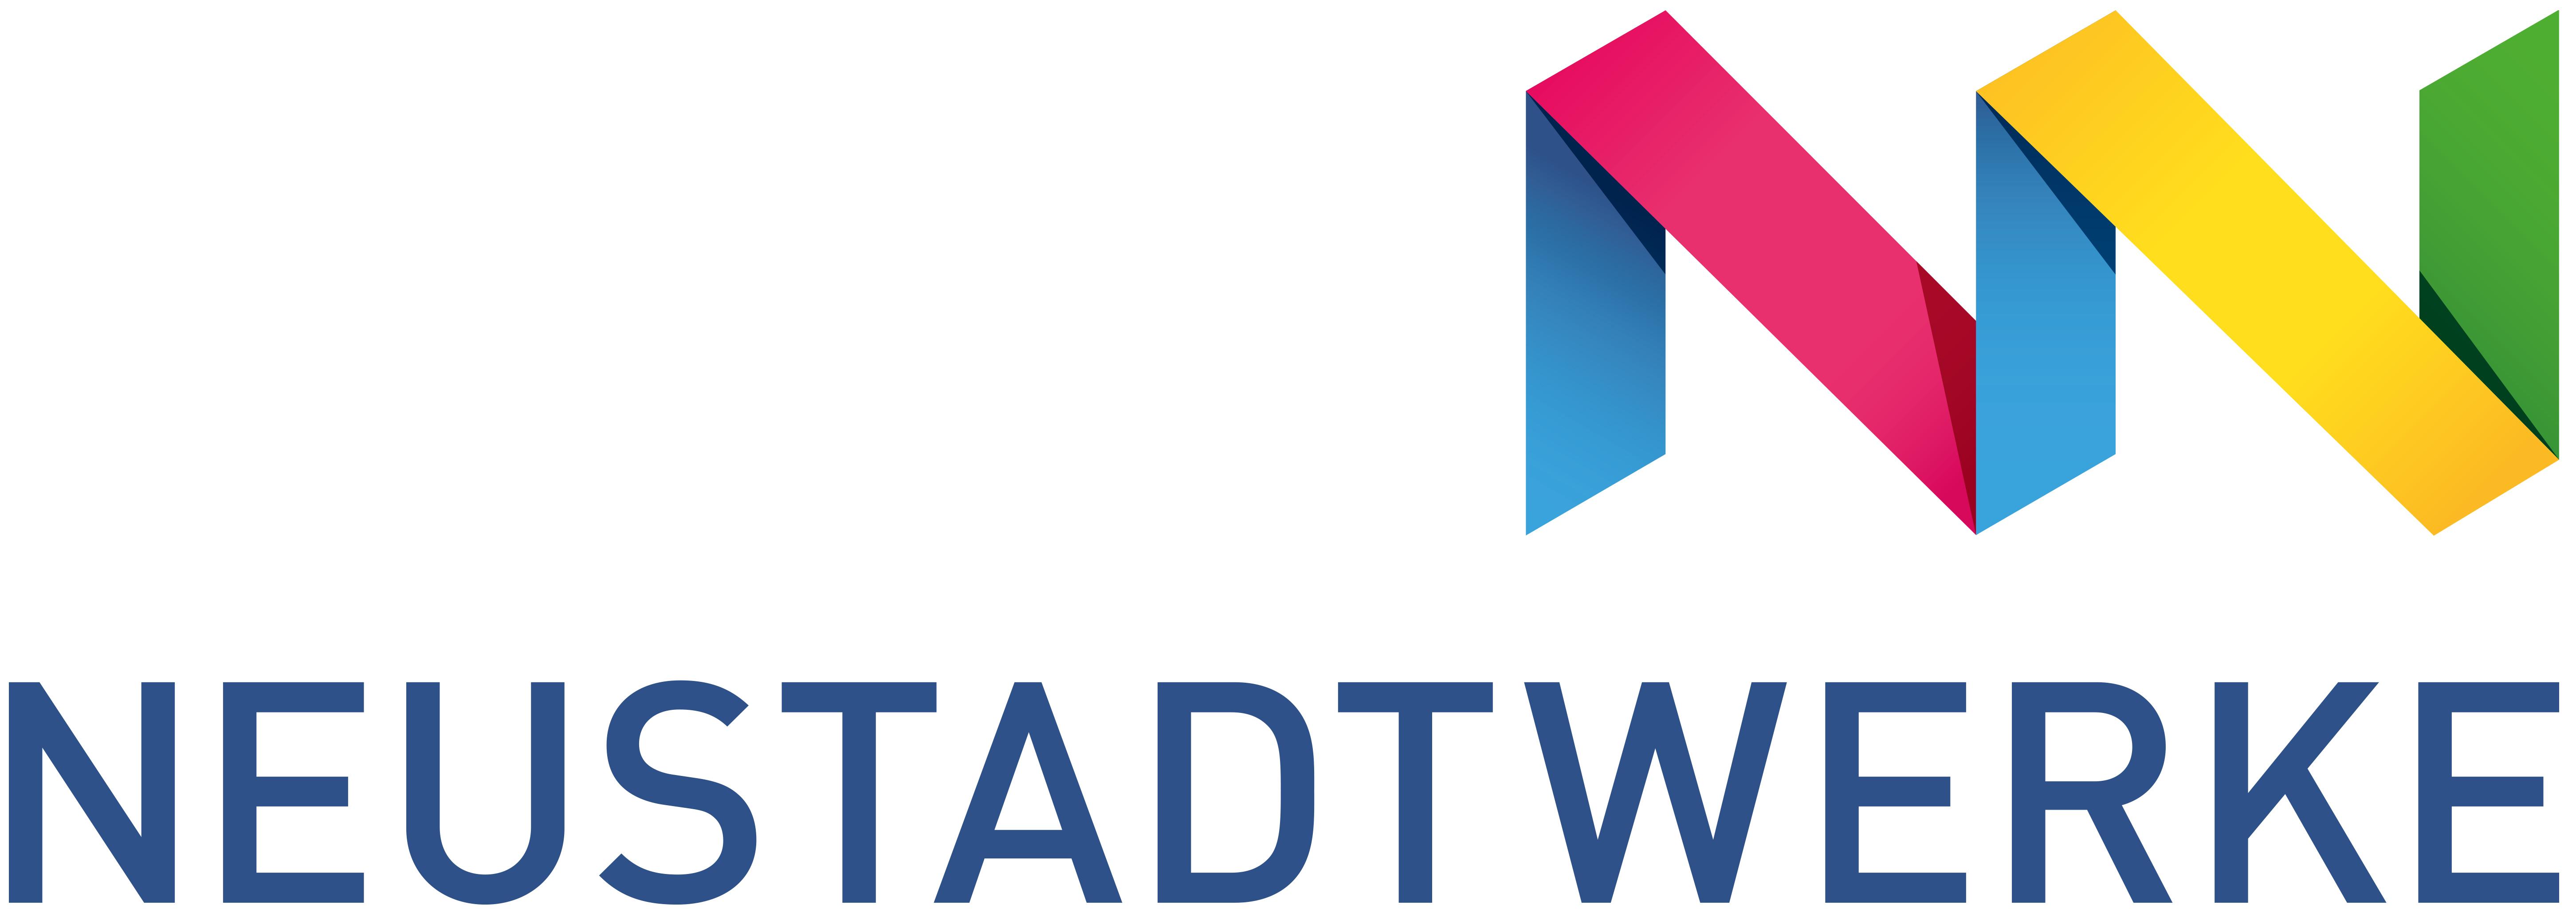 » Mediacenter-Datenarchiv/Bilder_Allgemein » Logo_Neustadtwerke.jpg